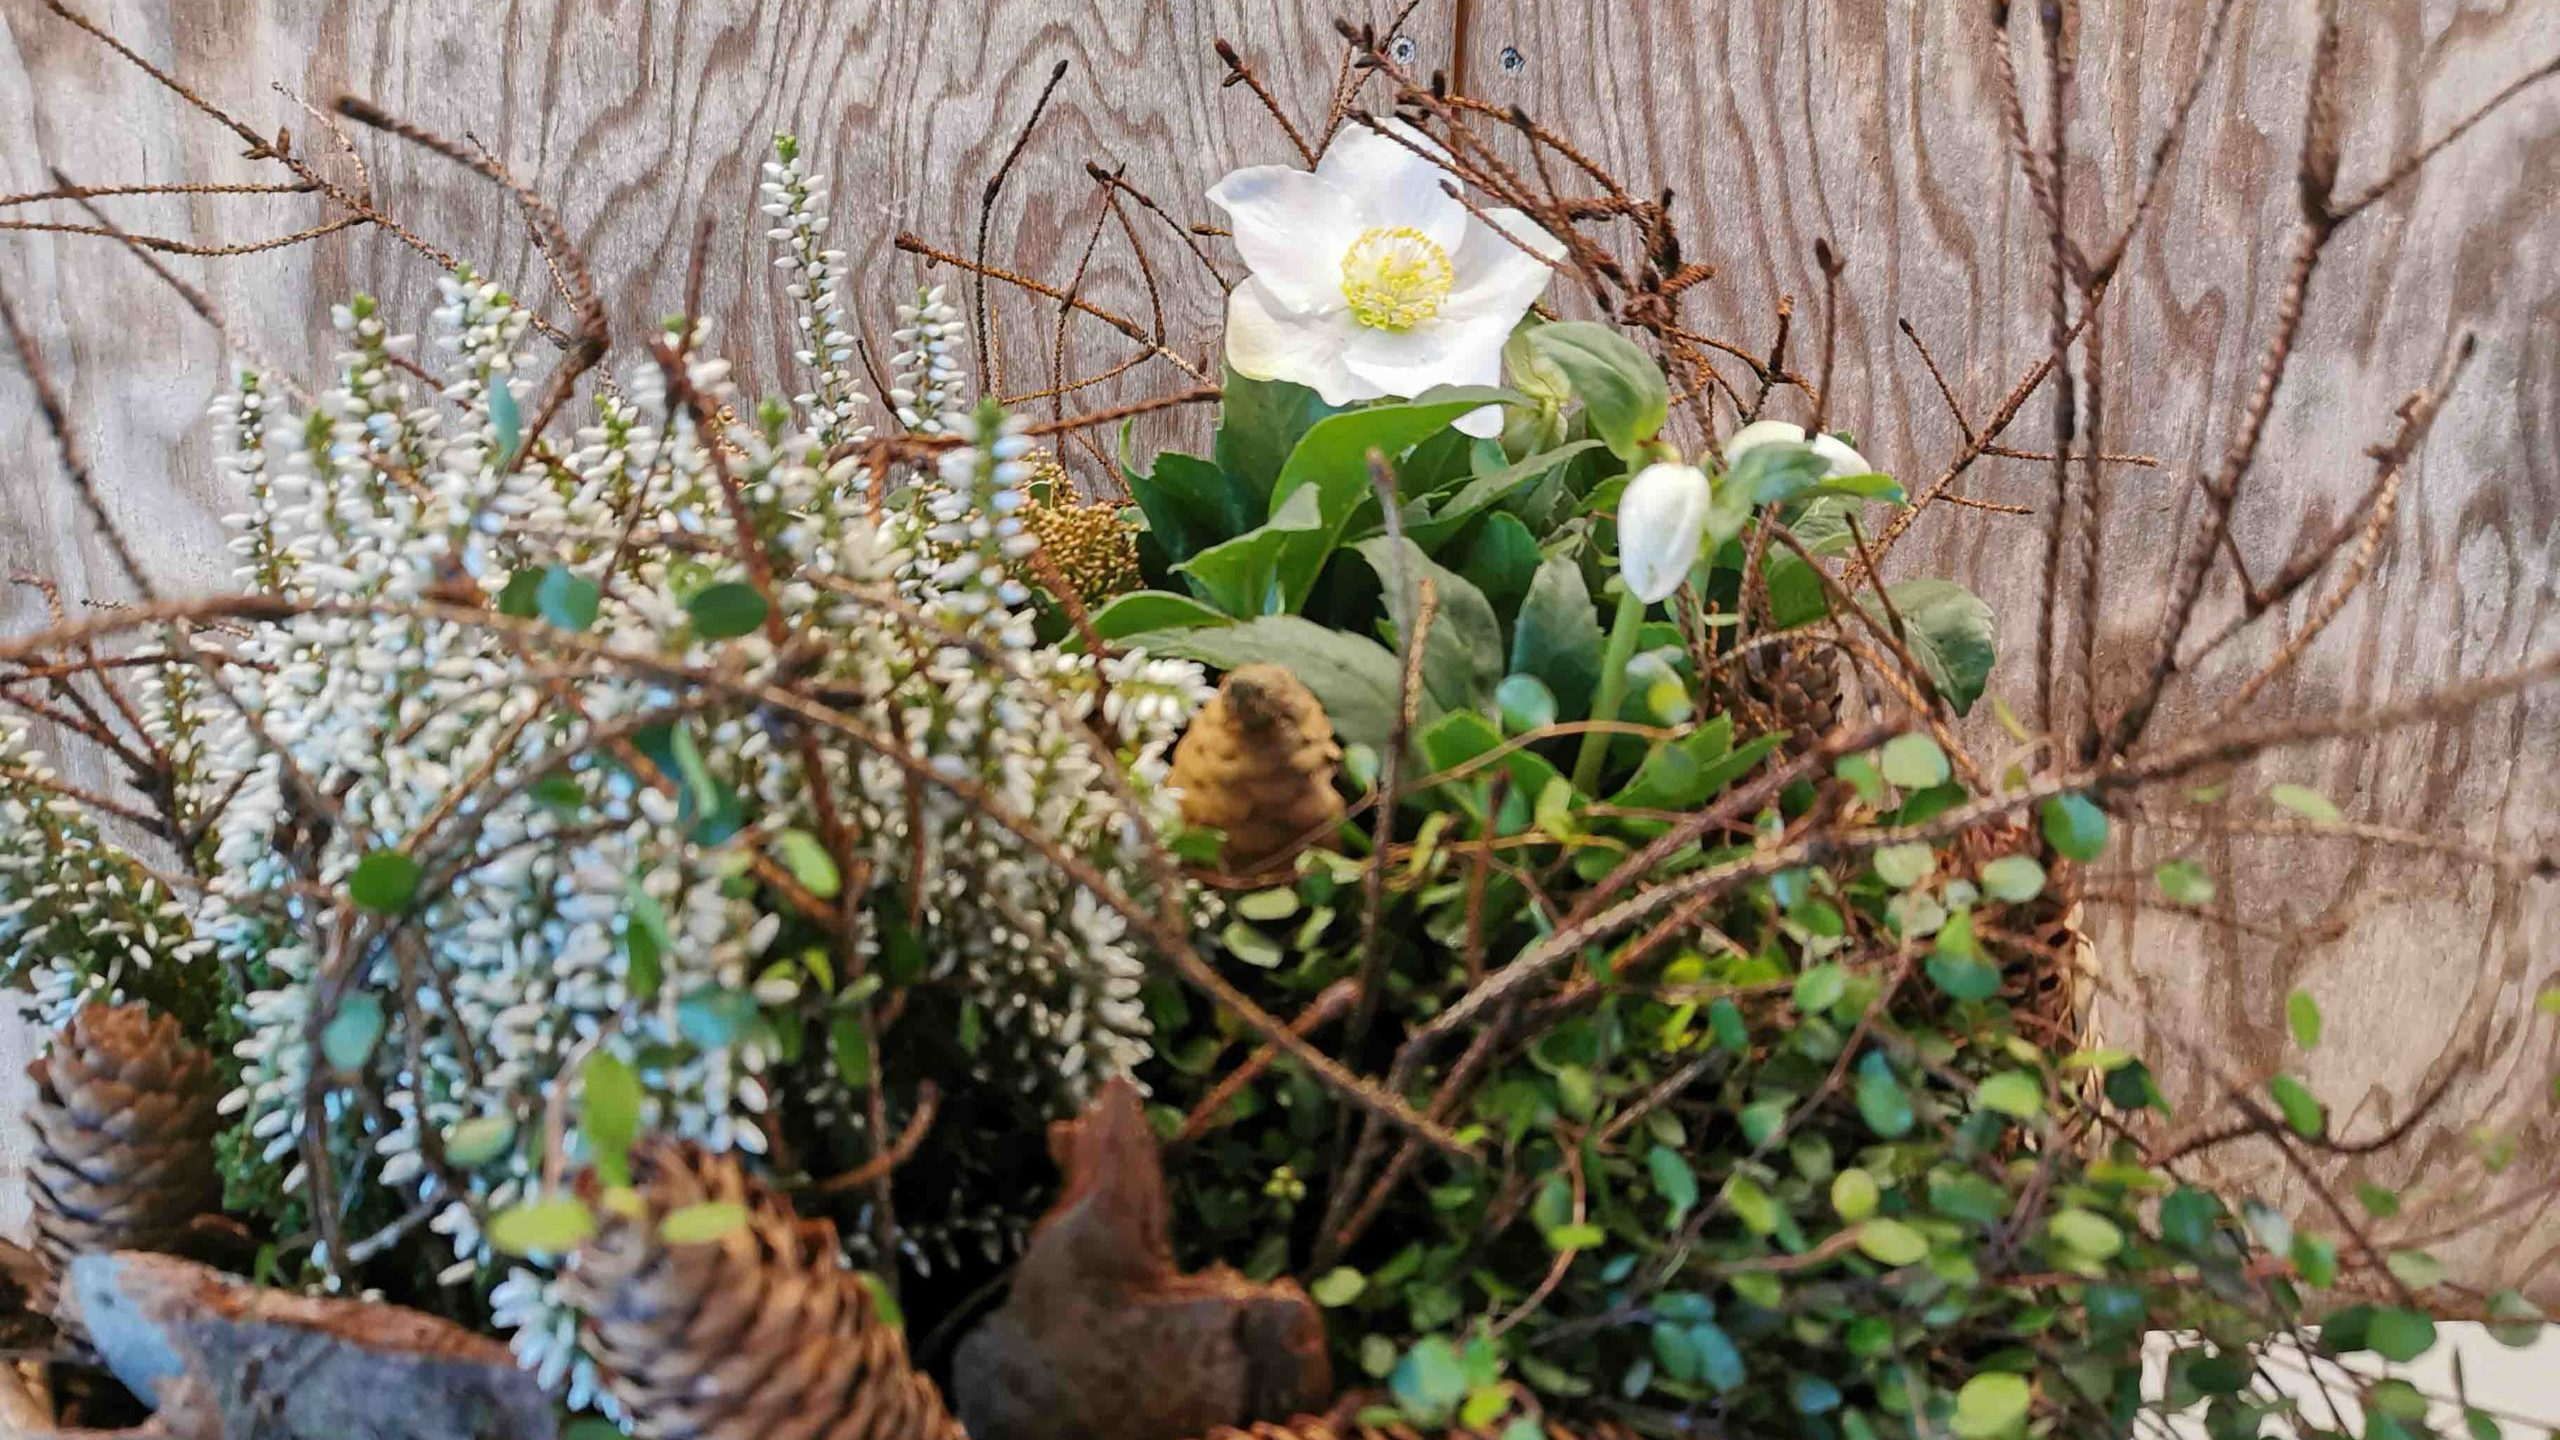 Bepflanzung, Gesteck, Urnenschmuck, Grabschmuck